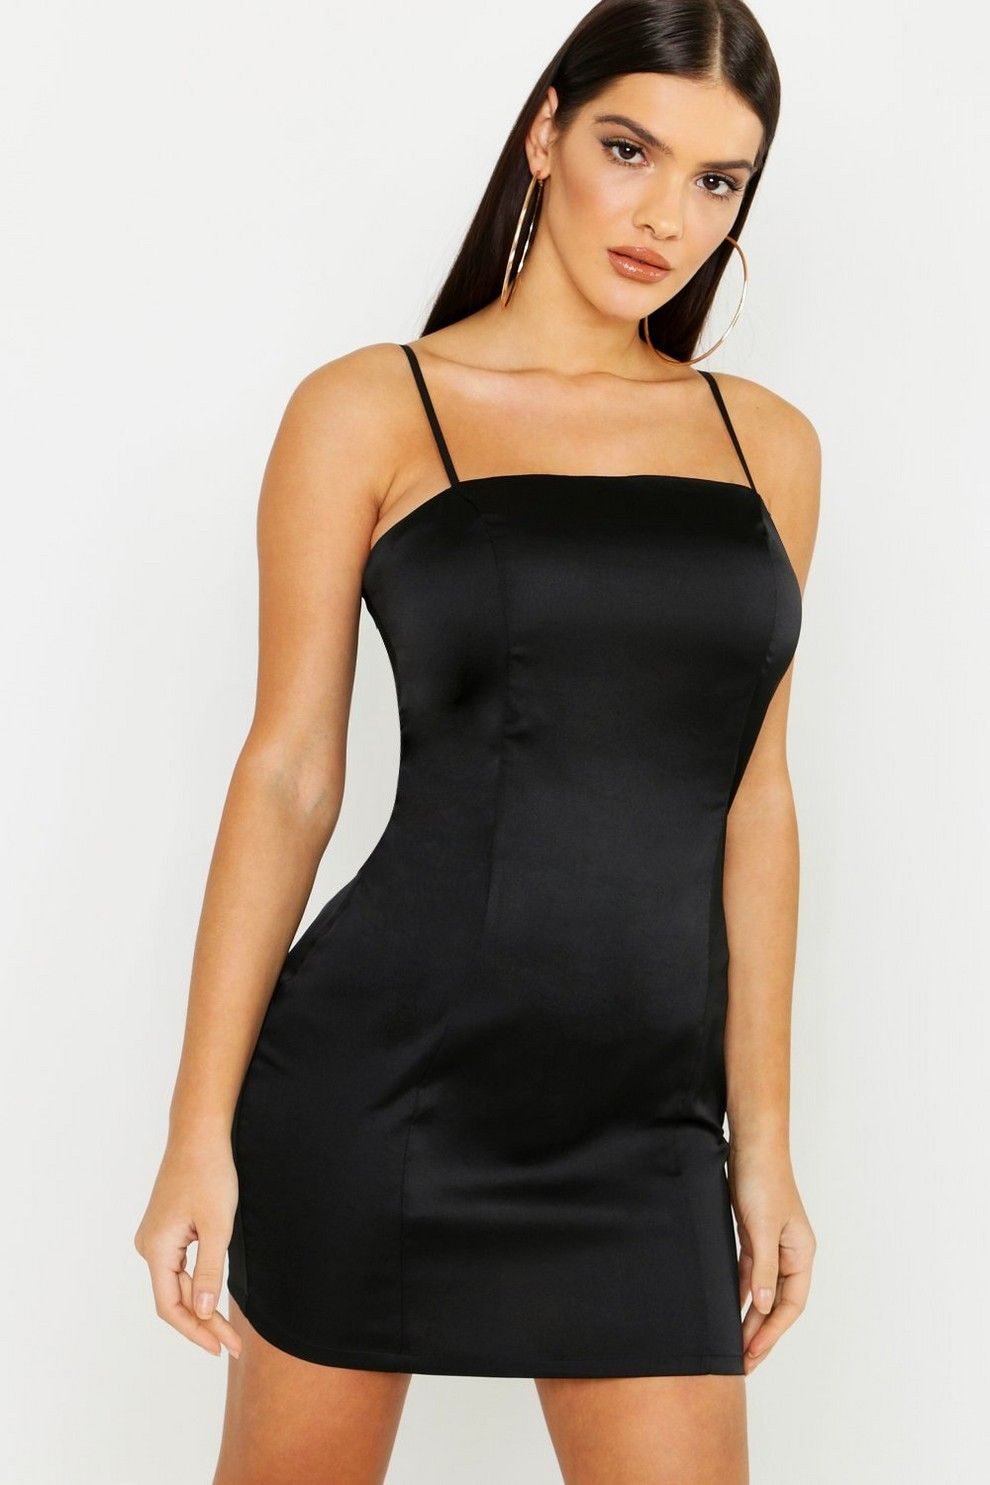 Satin Square Neck Bodycon Dress Boohoo Bodycon Dress Neck Bodycon Dress Black Bodycon Dress [ 1485 x 990 Pixel ]